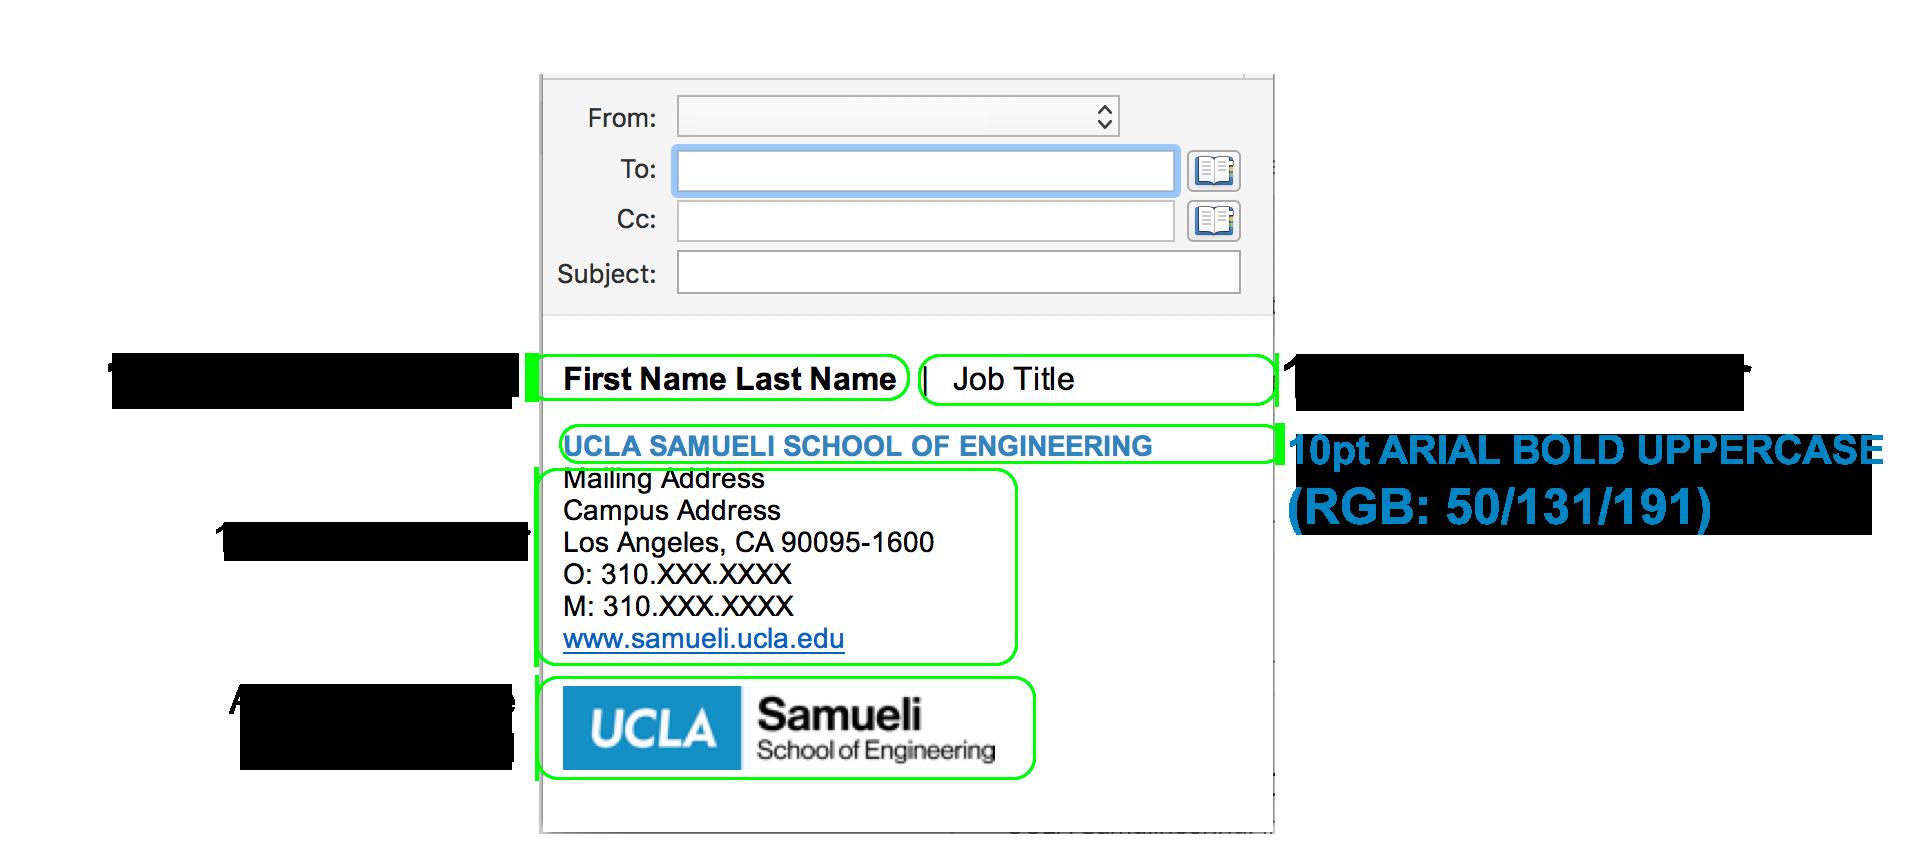 Style Guide Templates E-mail Signature | UCLA Samueli School